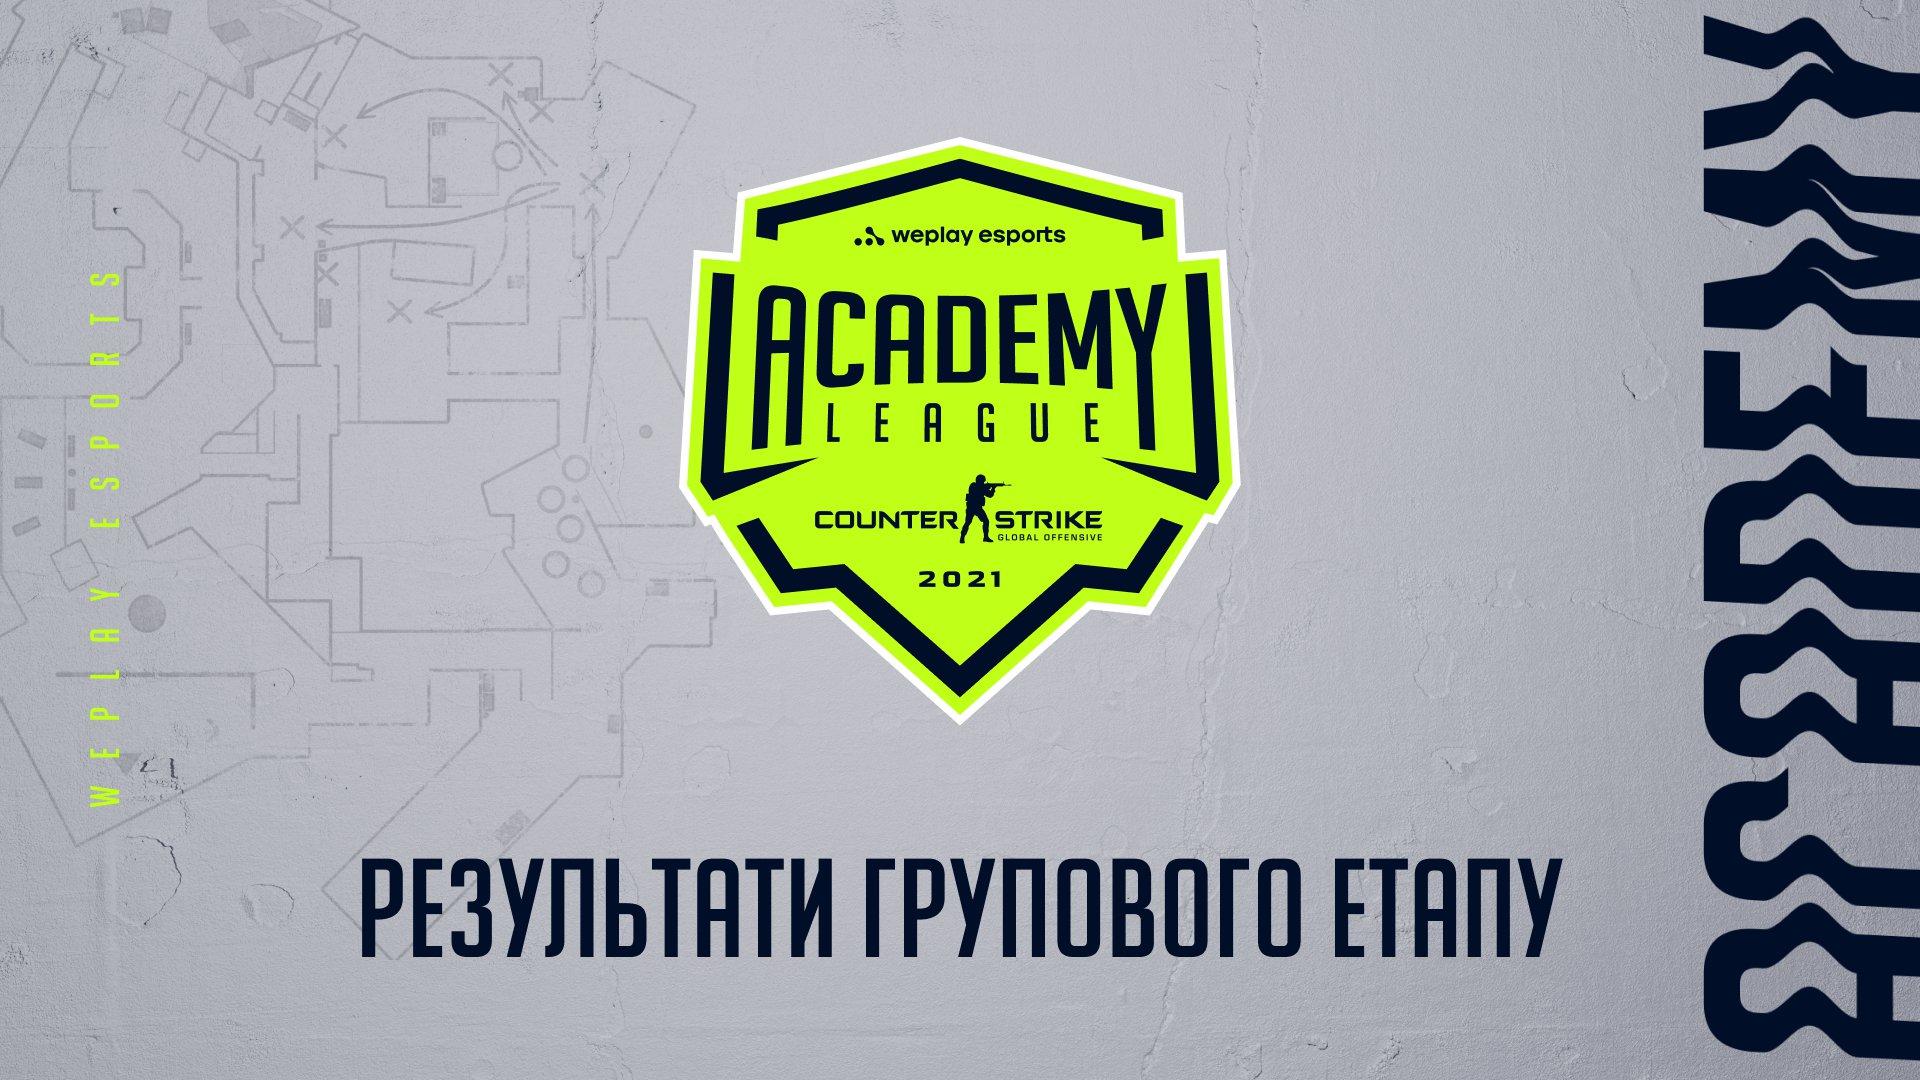 WePlay Academy League Season 2: результати групового етапу. Зображення: WePlay Holding